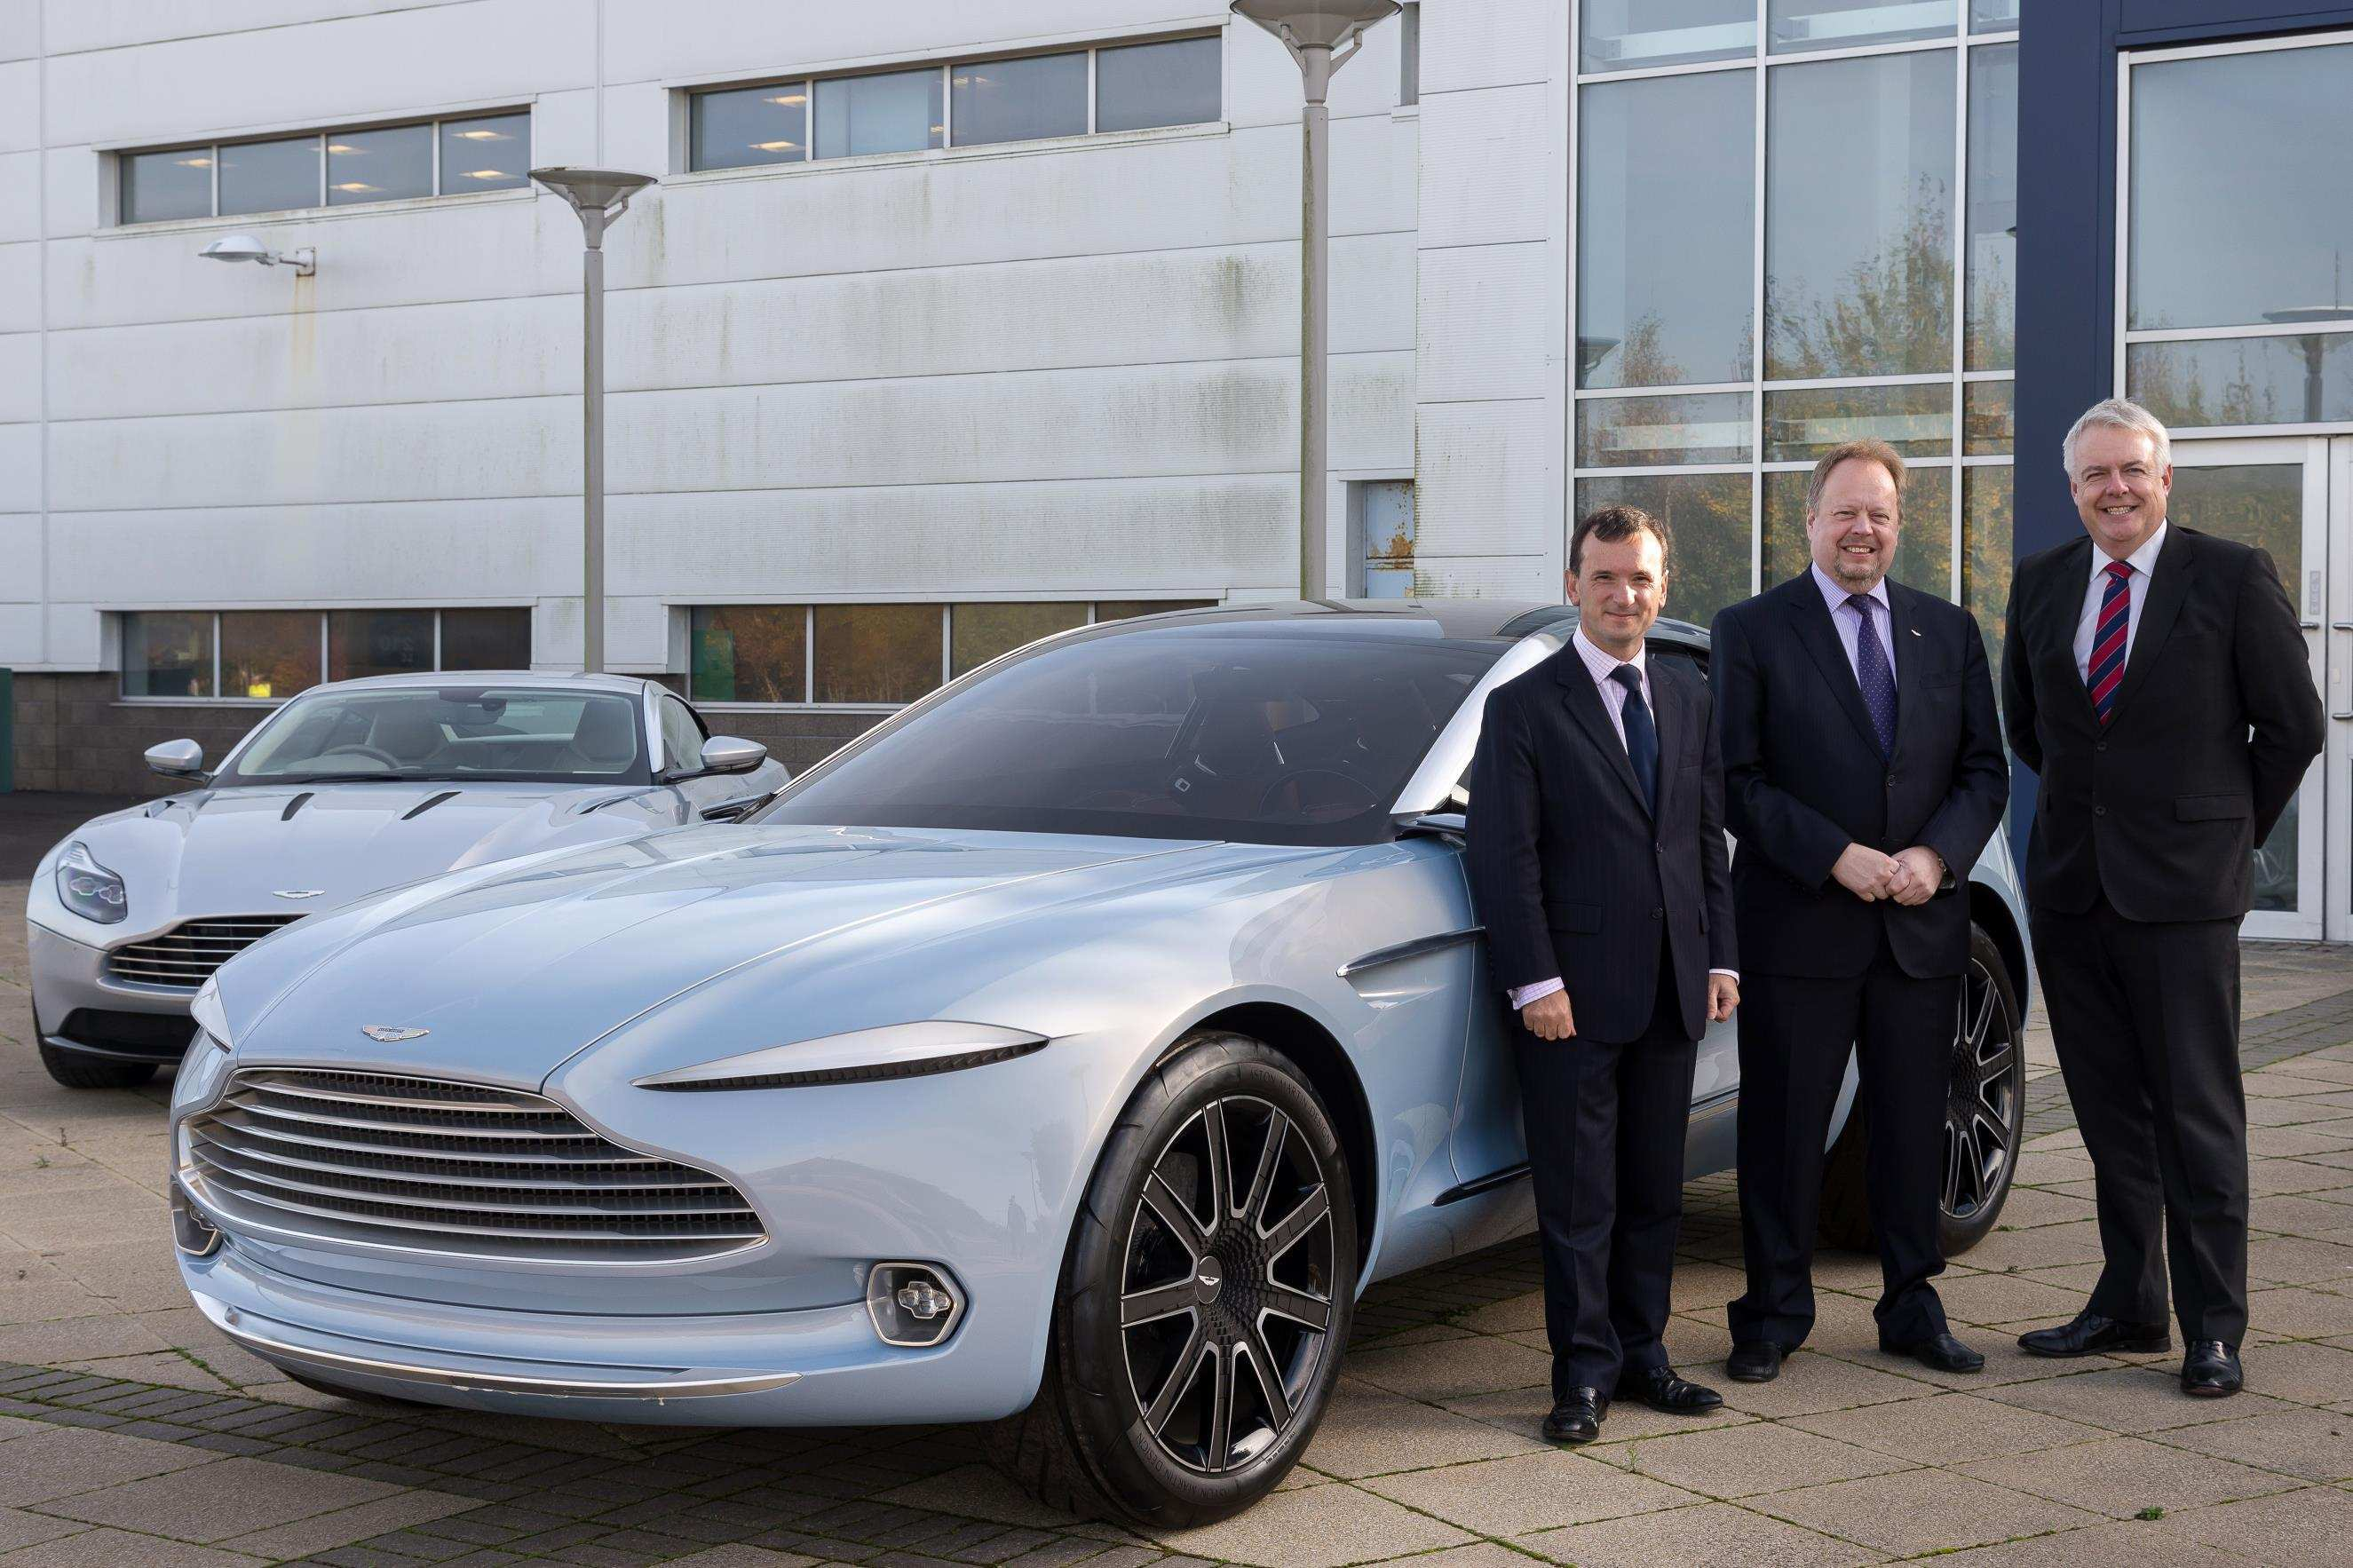 86 New 2019 Aston Martin Suv Performance for 2019 Aston Martin Suv